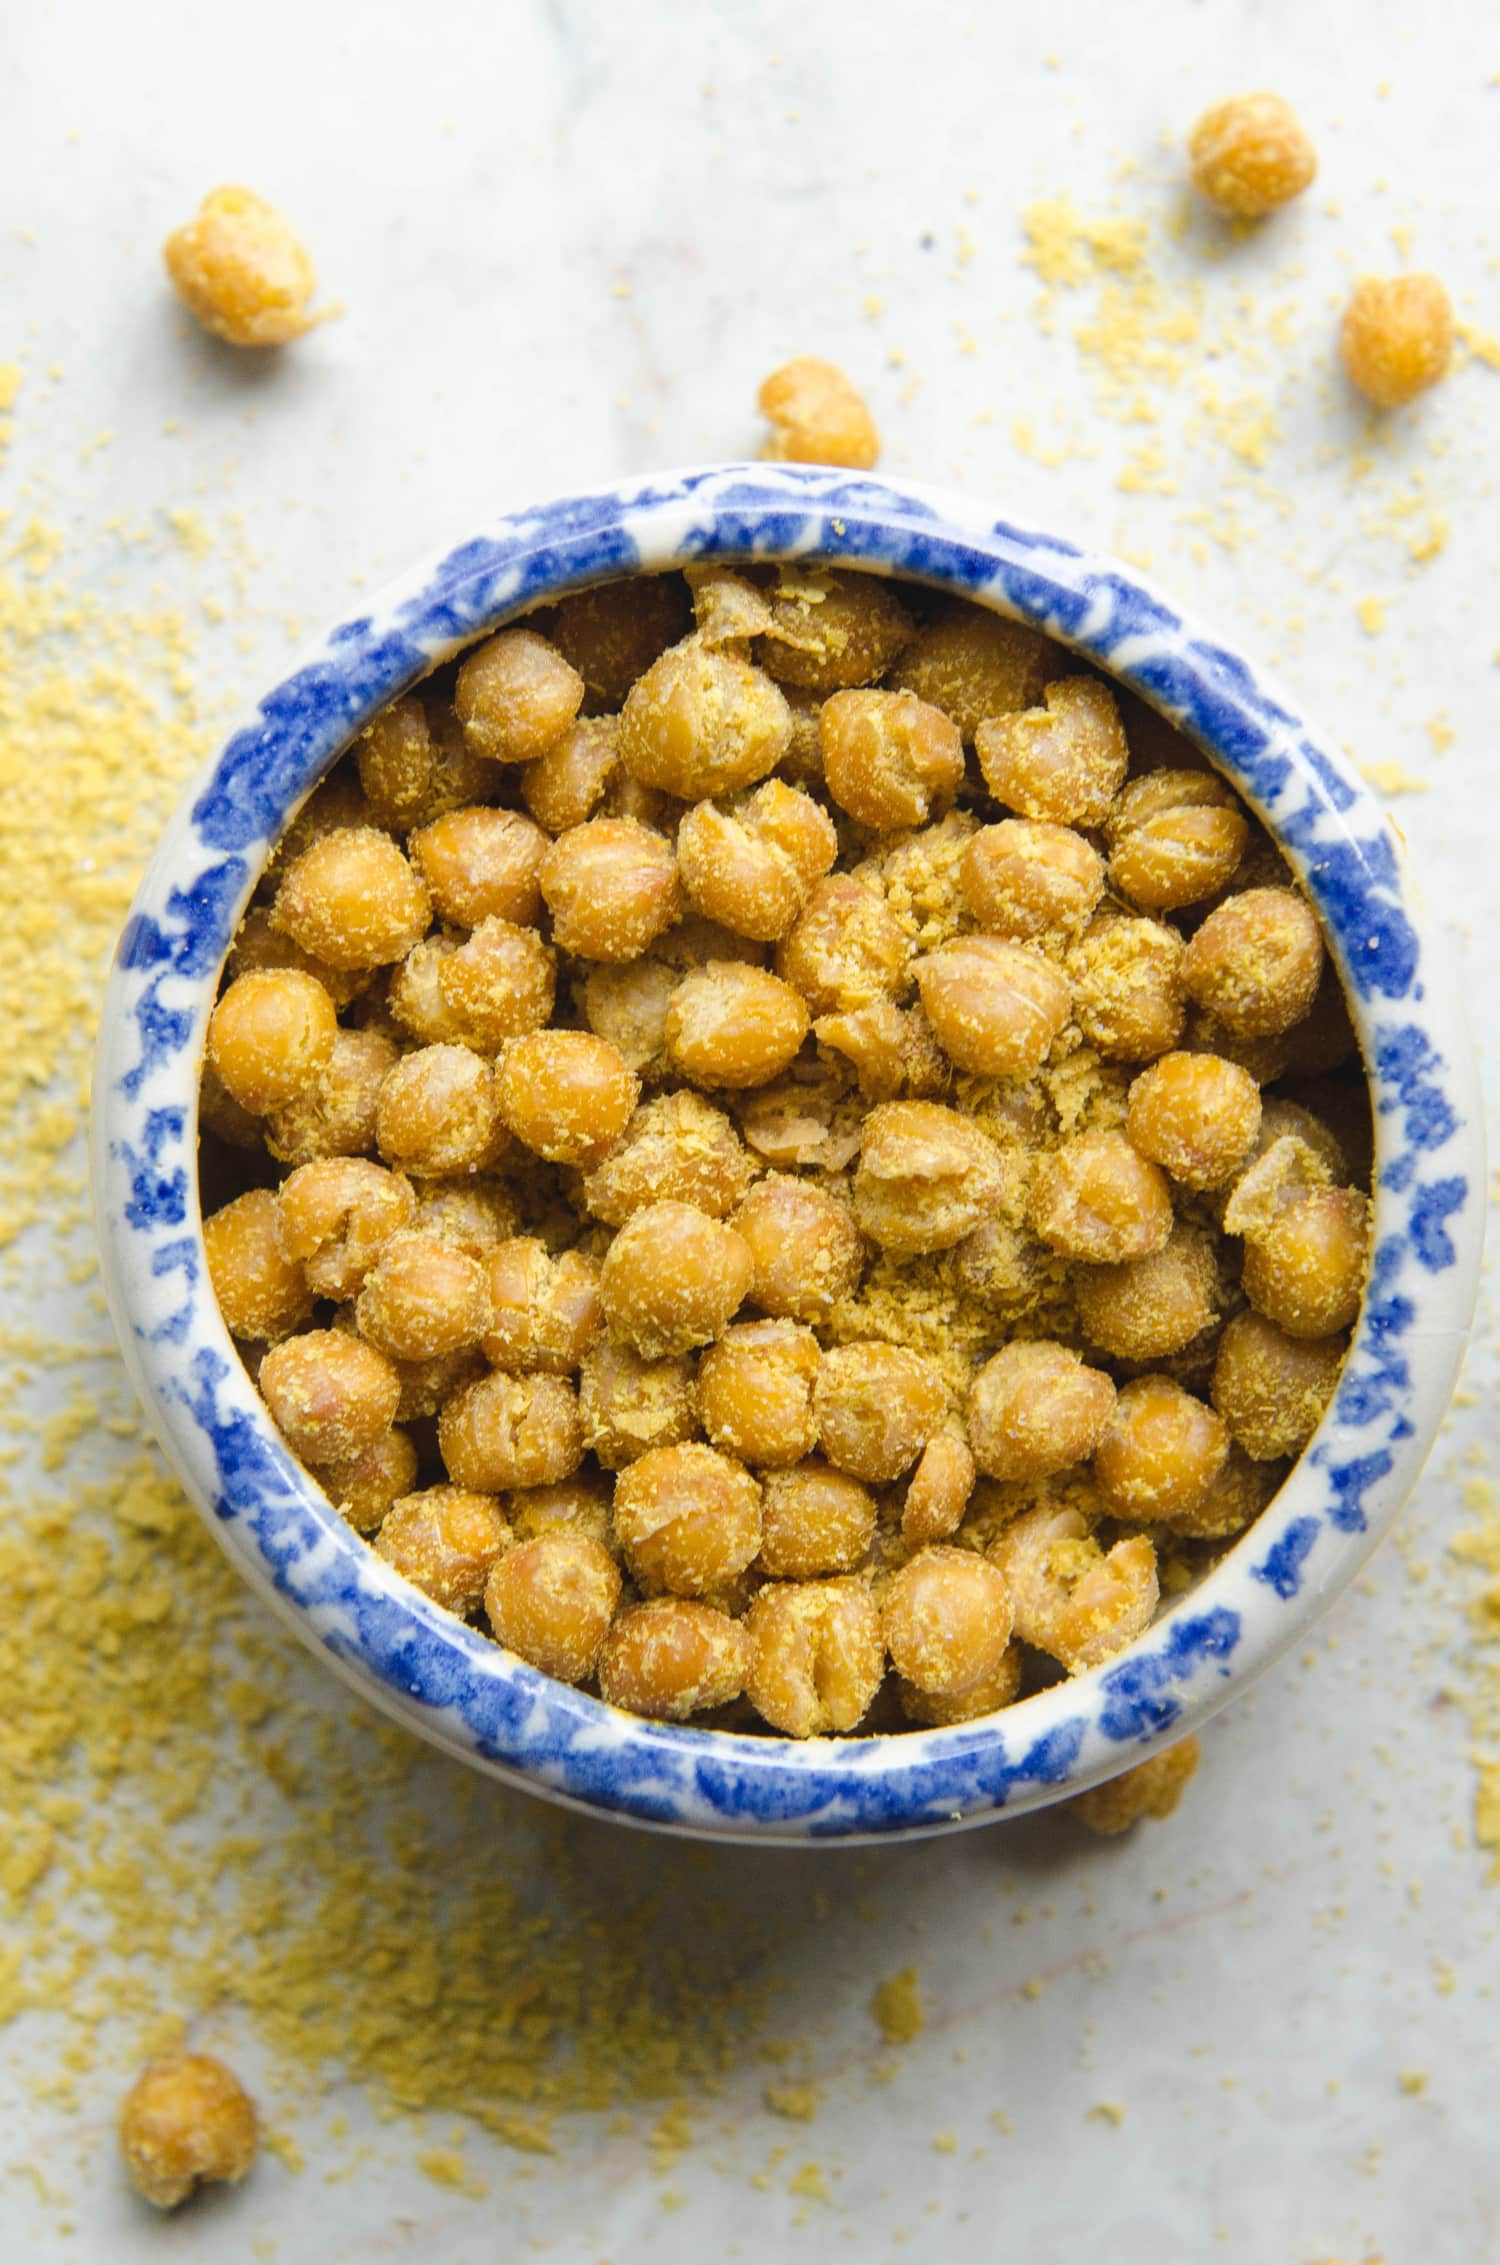 Recipe: Cheetos-Style Chickpeas